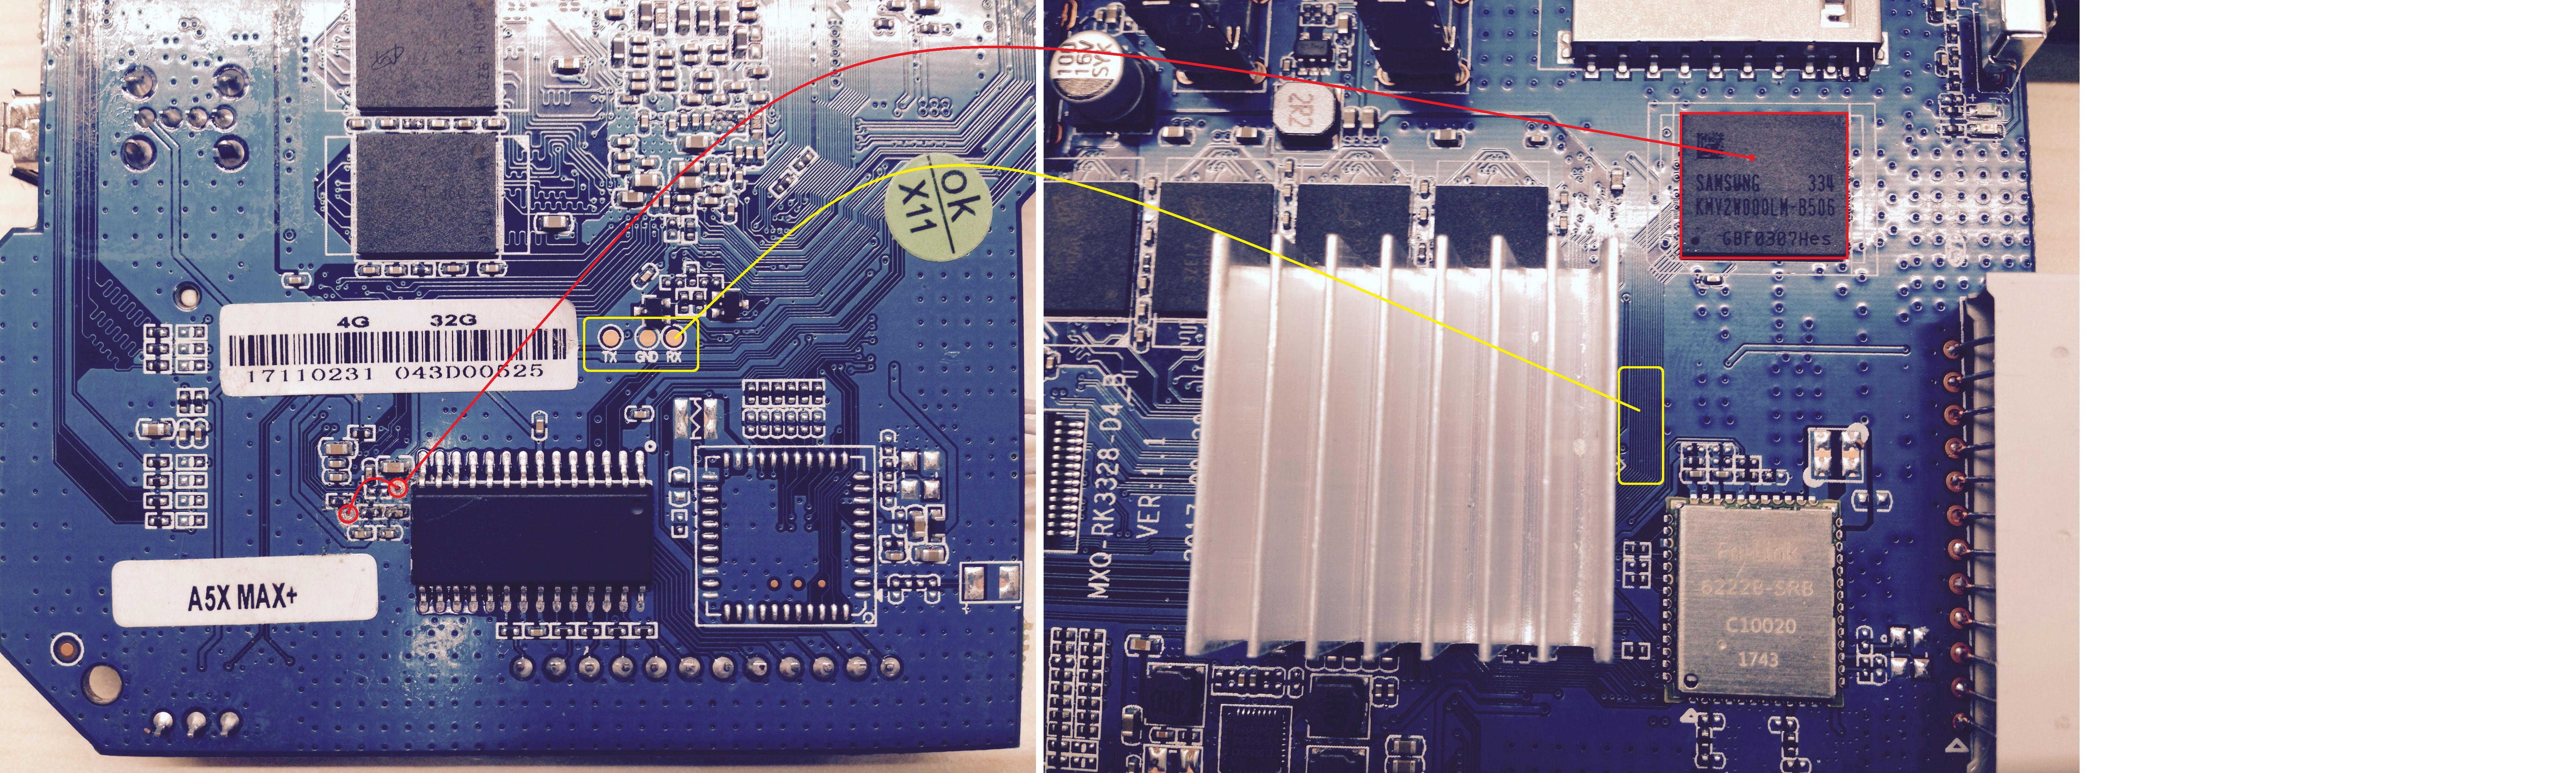 A5X MAX RK3328 4GB/16GB - Rockchip 3288 & 3328 - Armbian forum